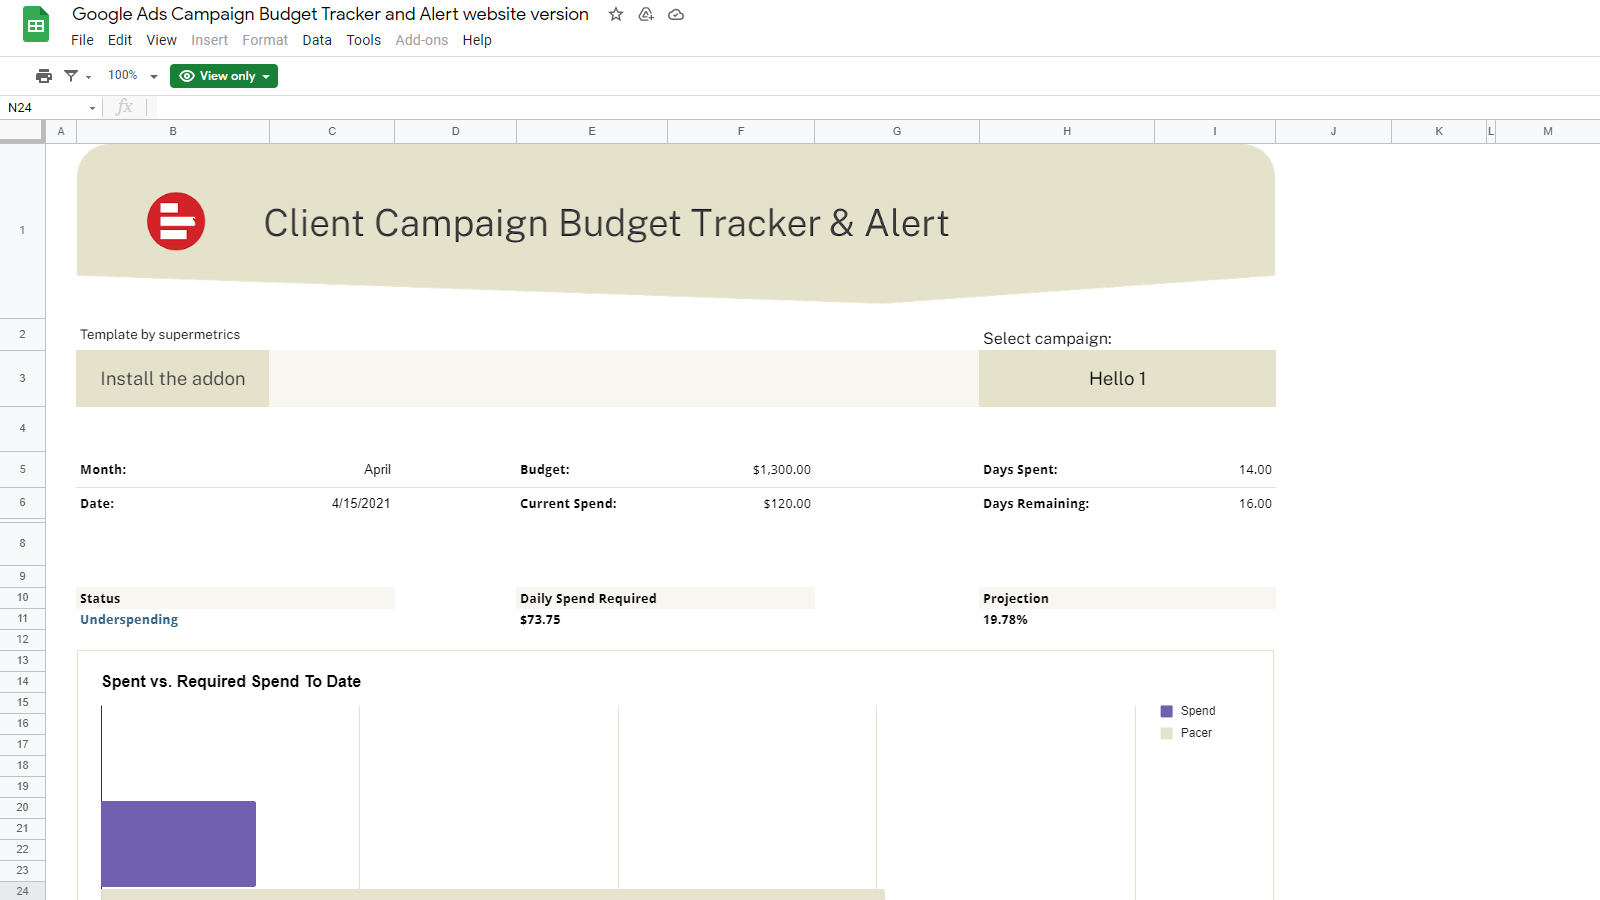 Google Ads Campaign Budget Tracker and Alert website